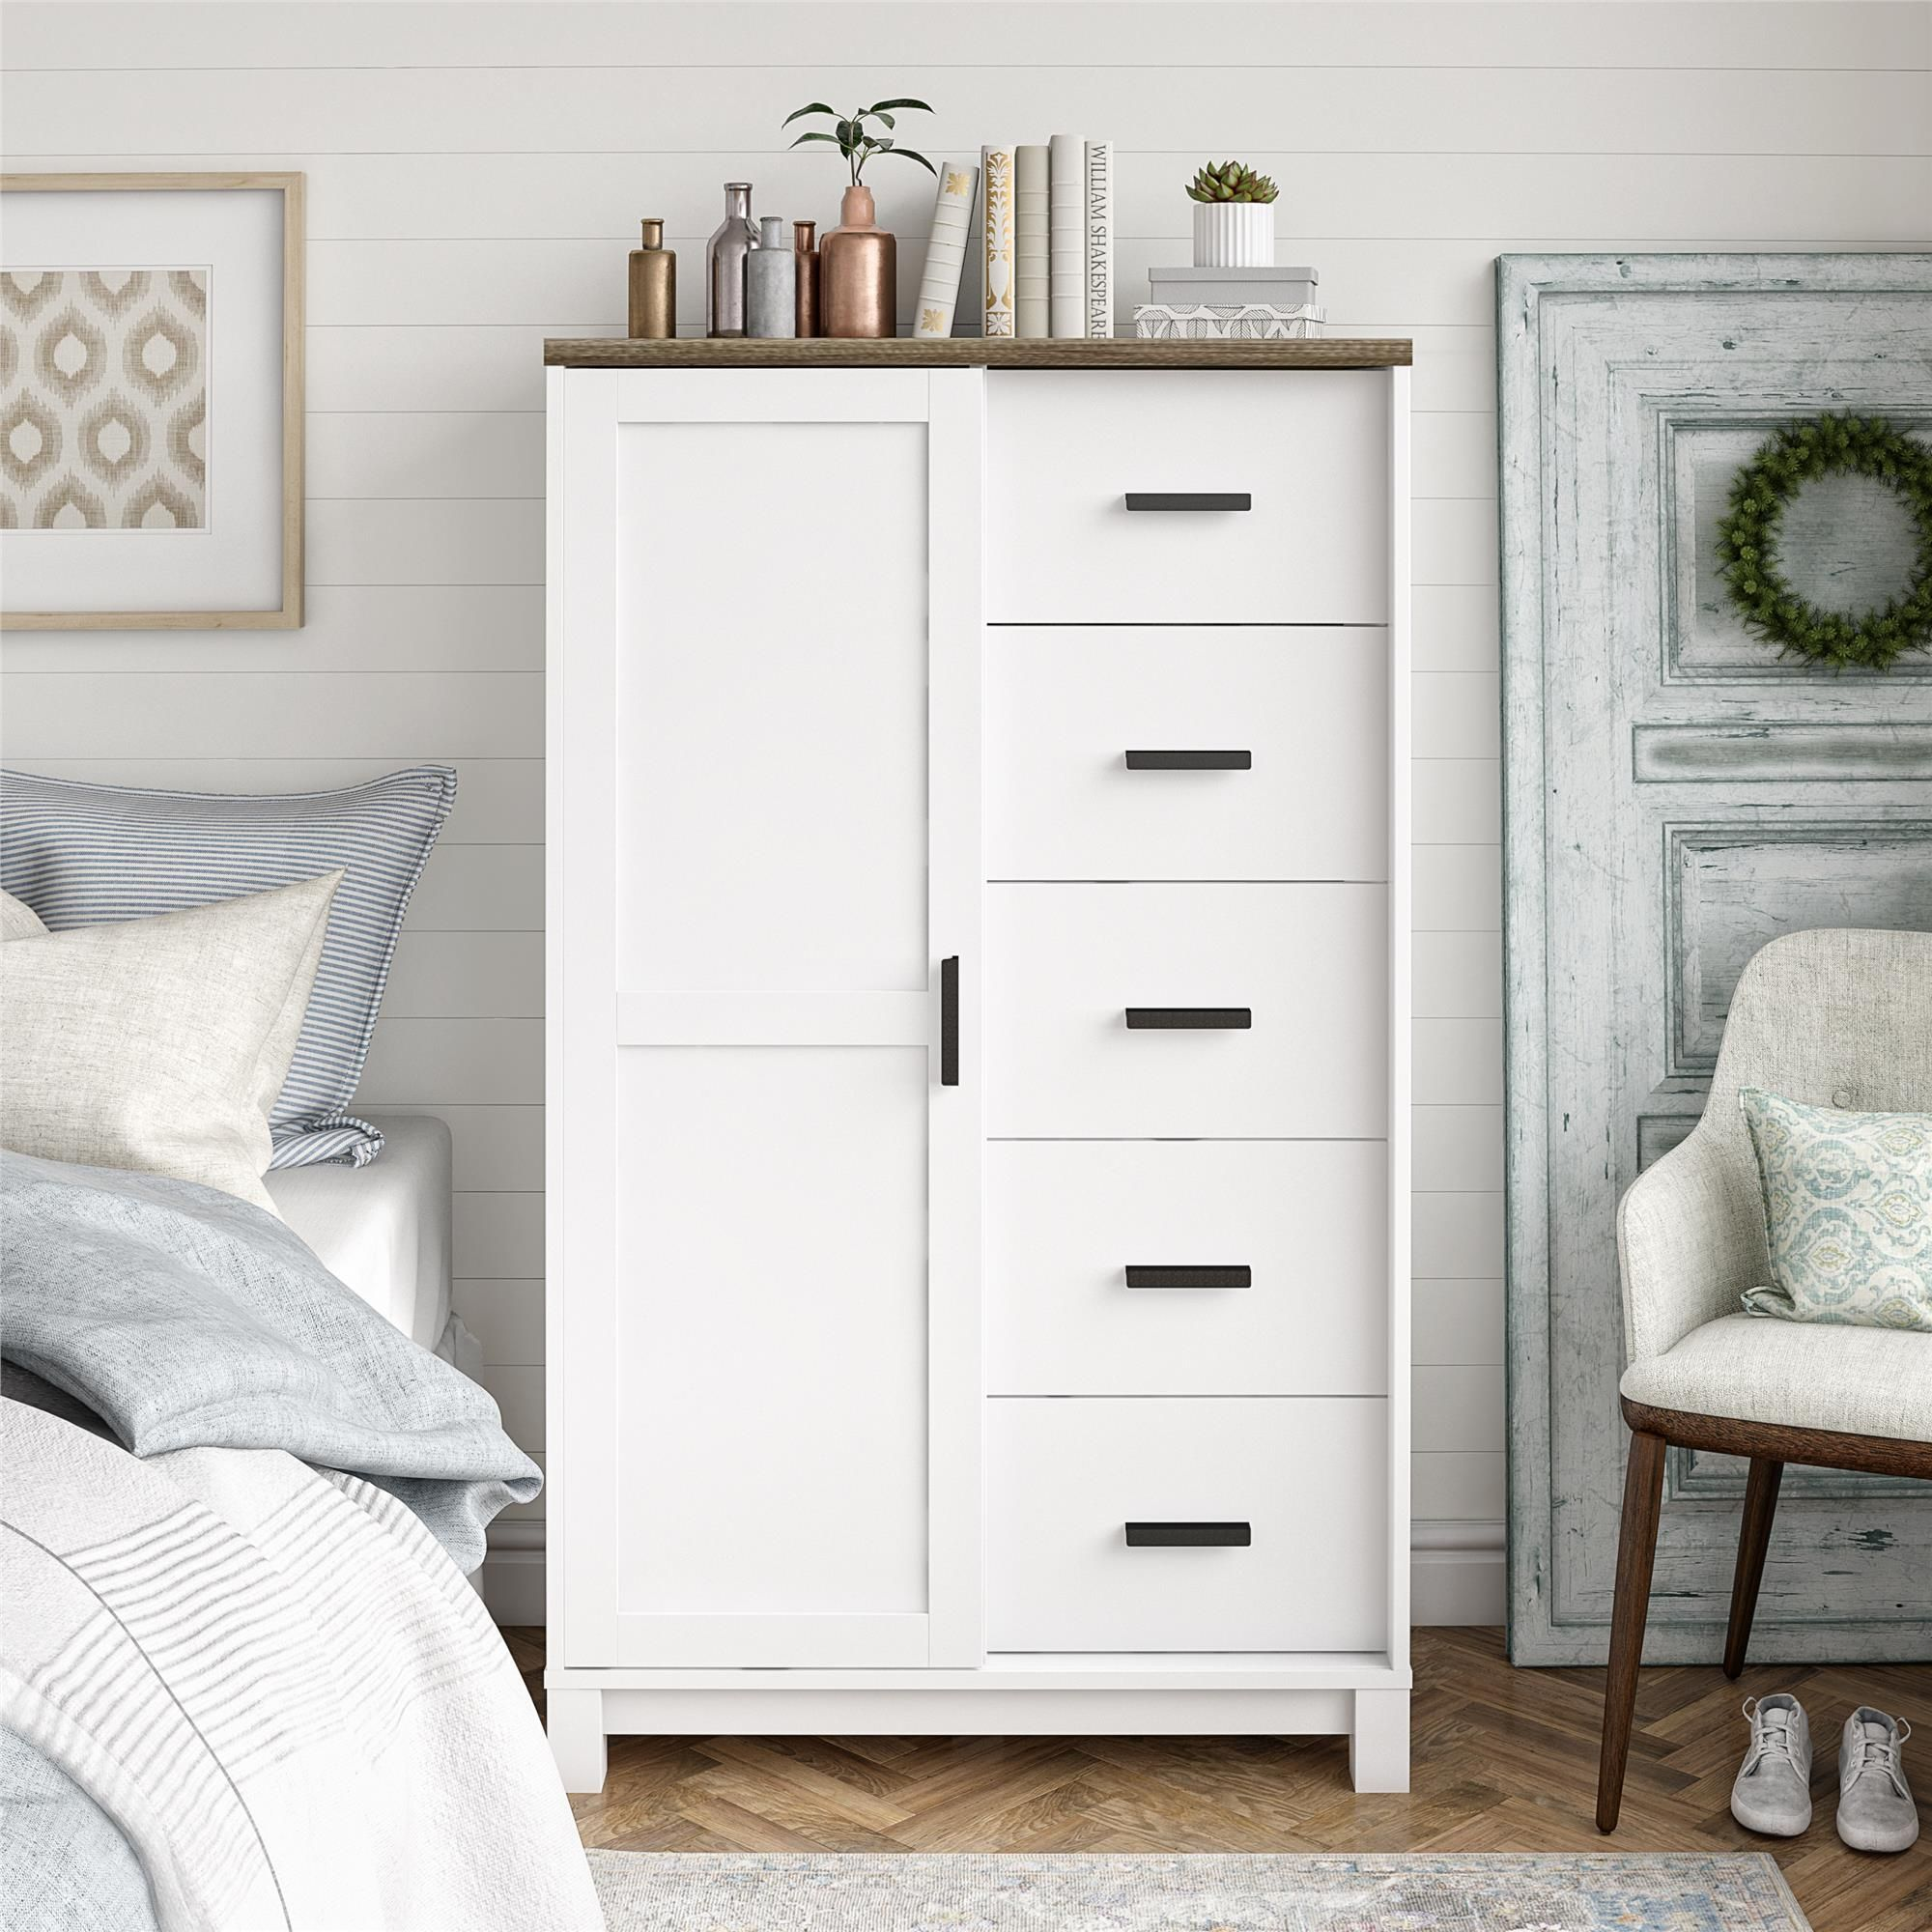 Ameriwood Home Bay Hills Gentlemen S Chest White Walmart Com Furniture White Chests Bedroom Decor [ 2000 x 2000 Pixel ]